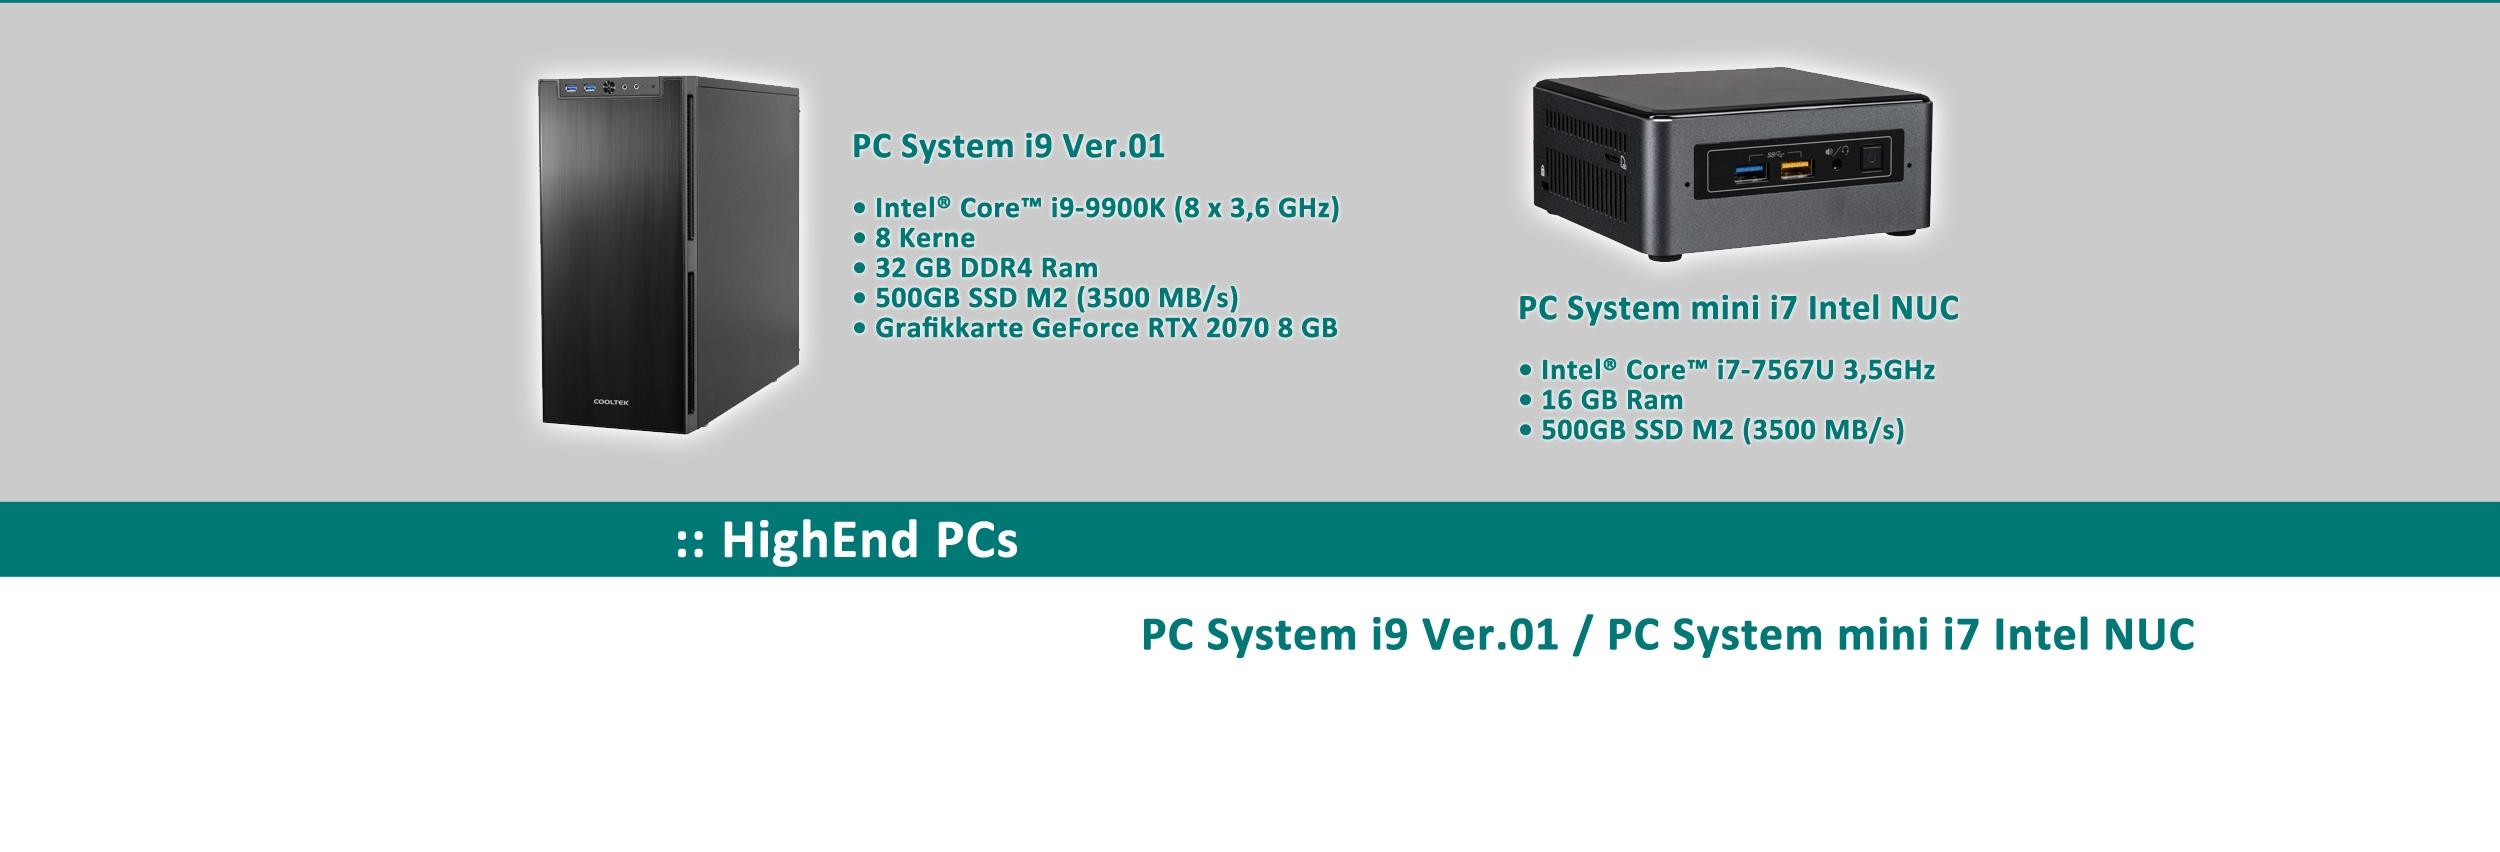 HighEnd PCs